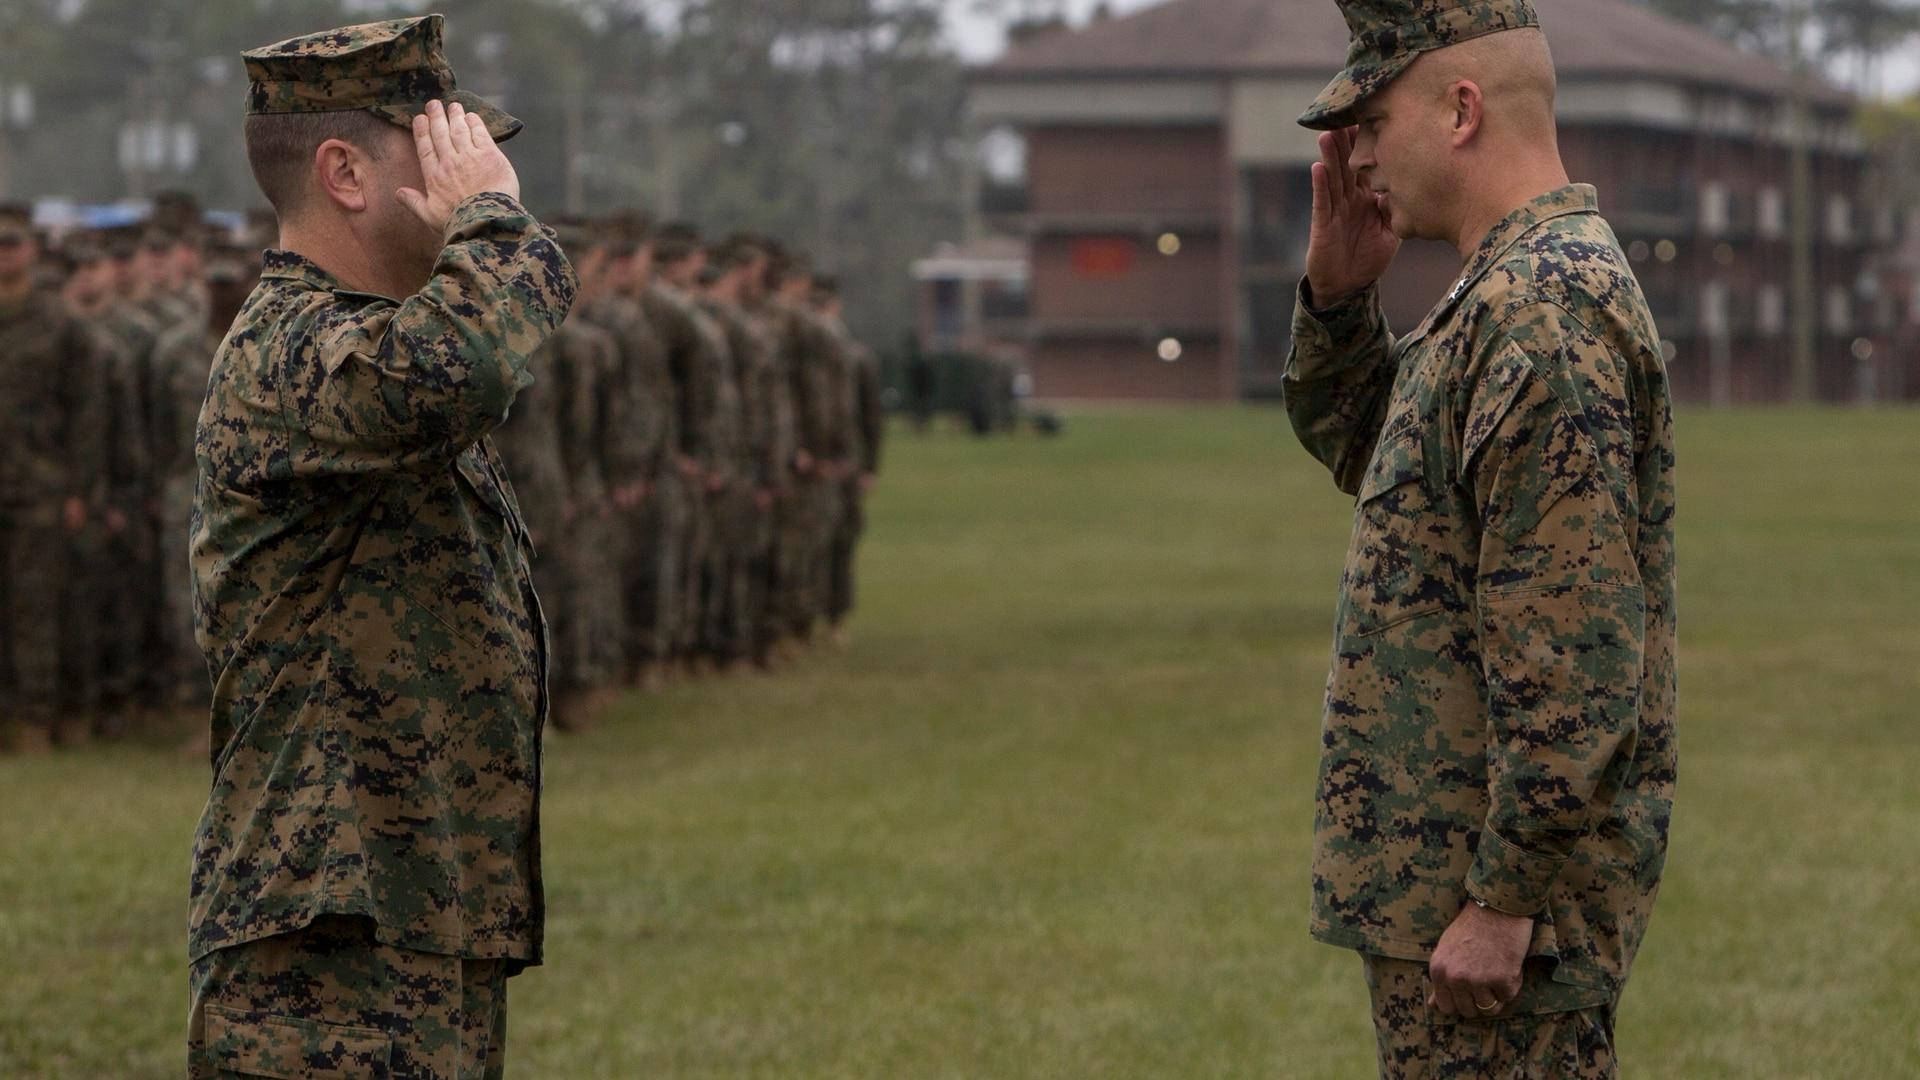 Maj. Gen. David Furness, right, at Camp Lejeune, North Carolina, Nov. 9, 2018. (Cpl. Christian J. Robertson/Marine Corps)